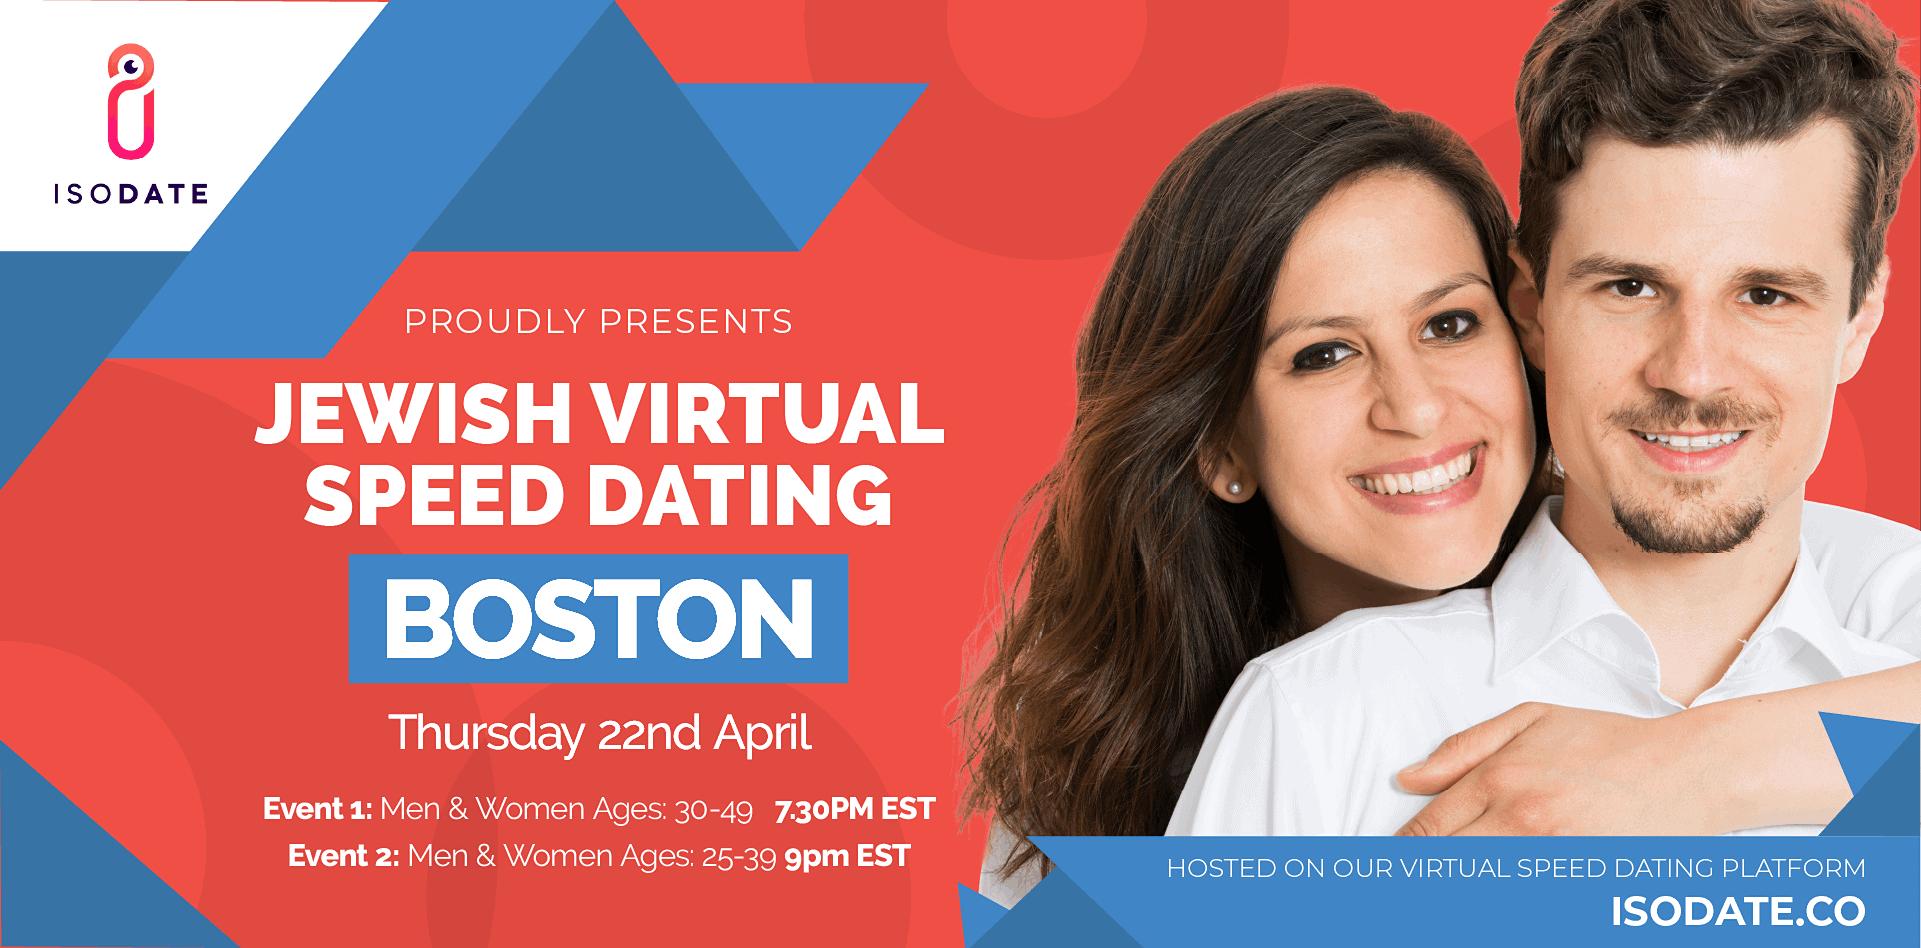 Isodate's Boston Jewish Virtual Speed Dating